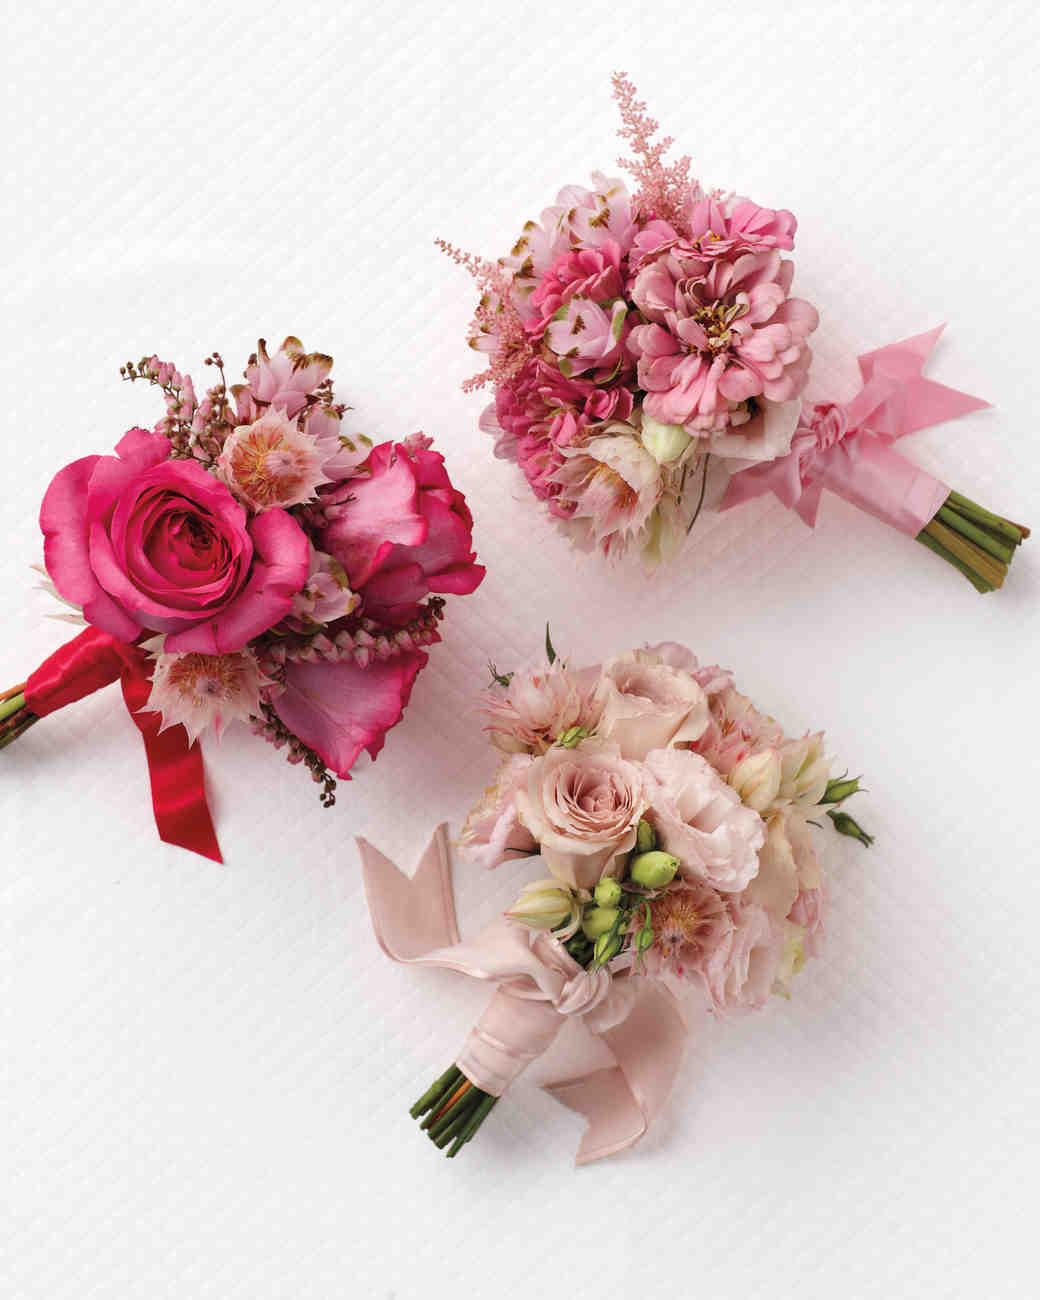 wedding-nosegays-mwd109325.jpg